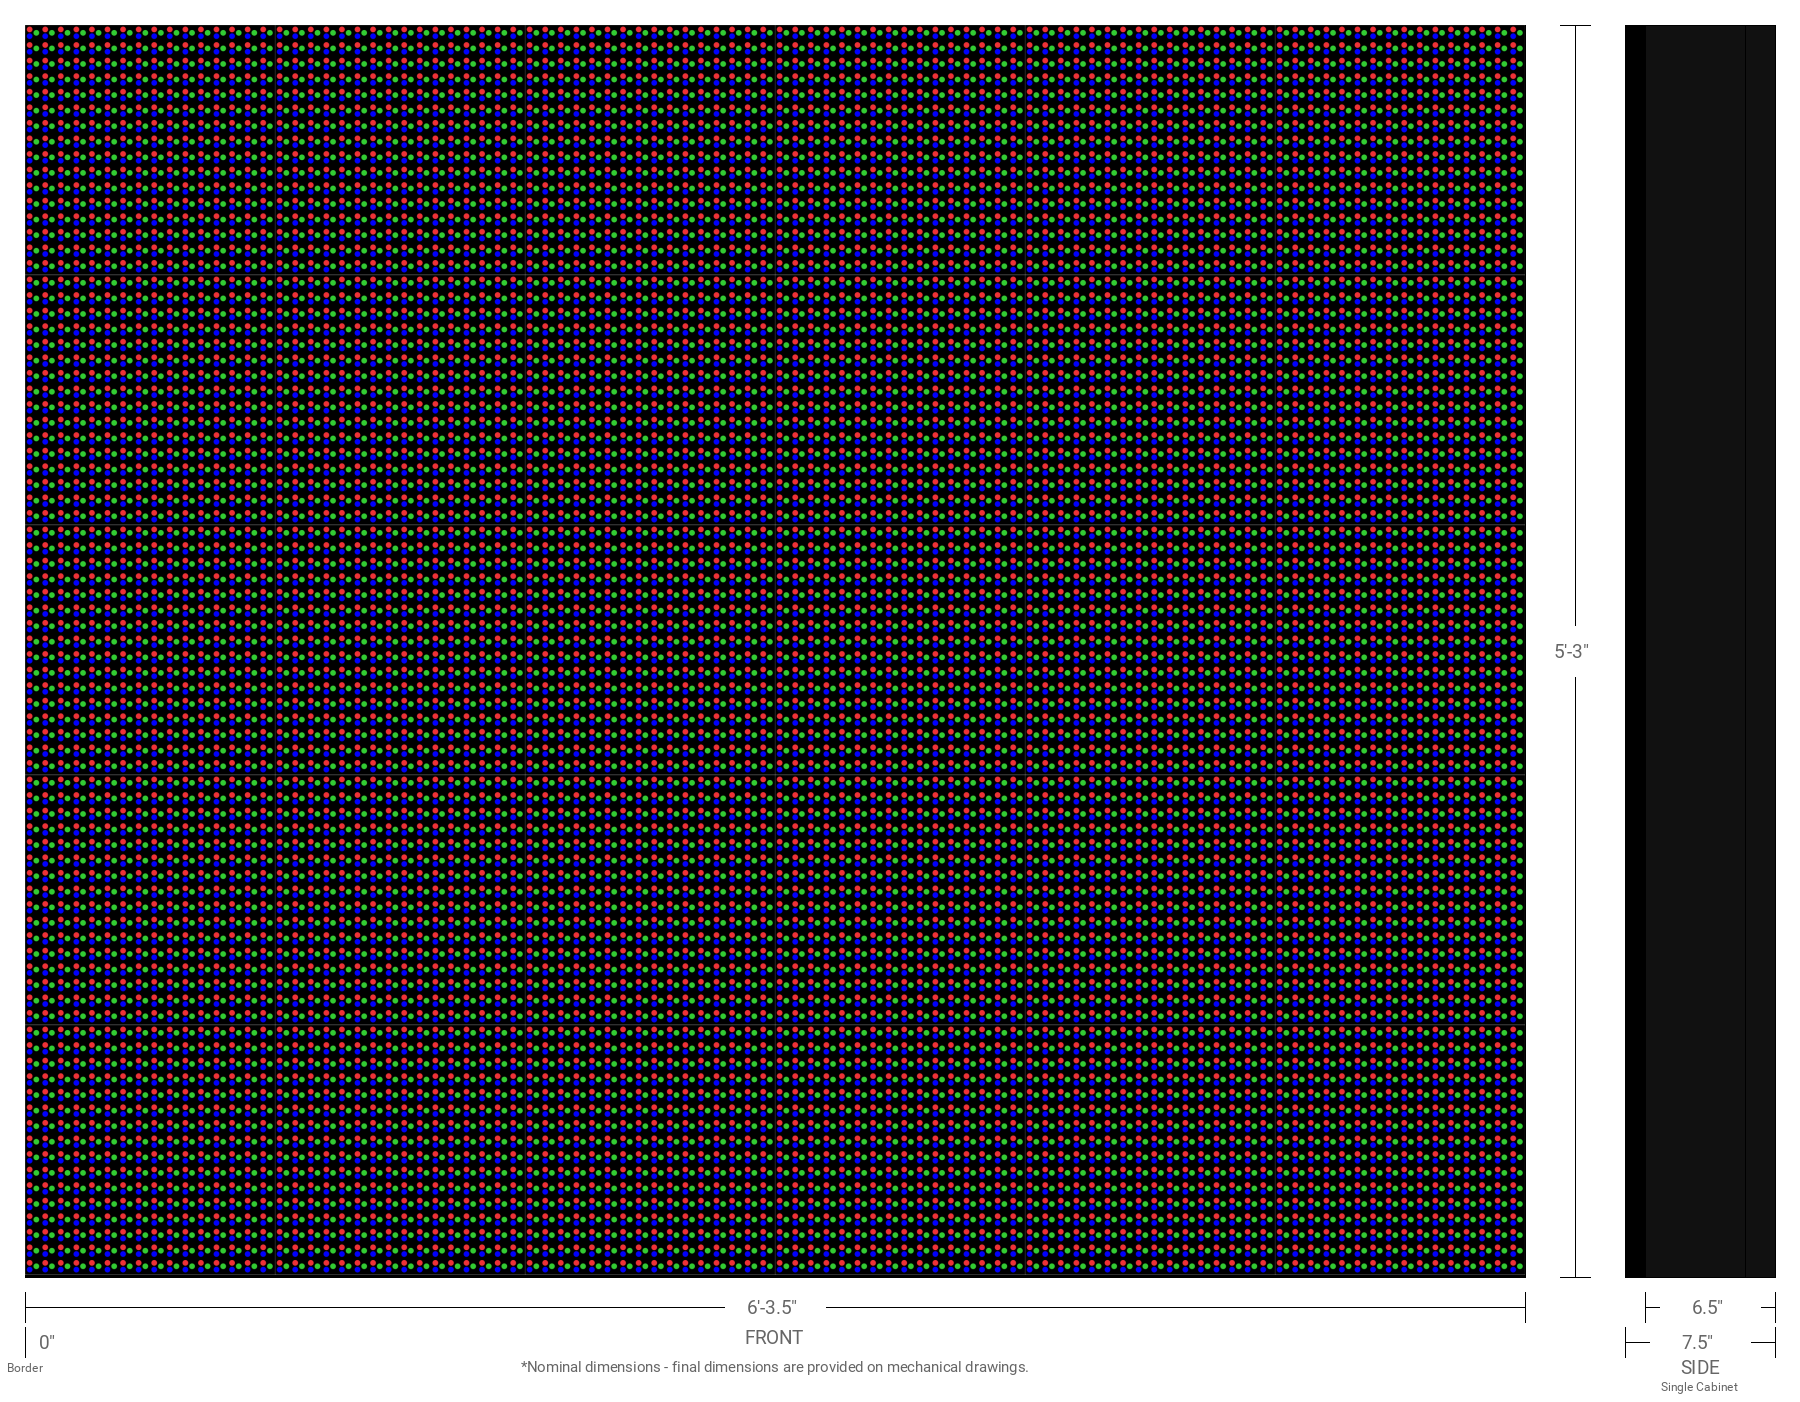 Aurora 20mm 80x96 Single Sided Full Color LED Display